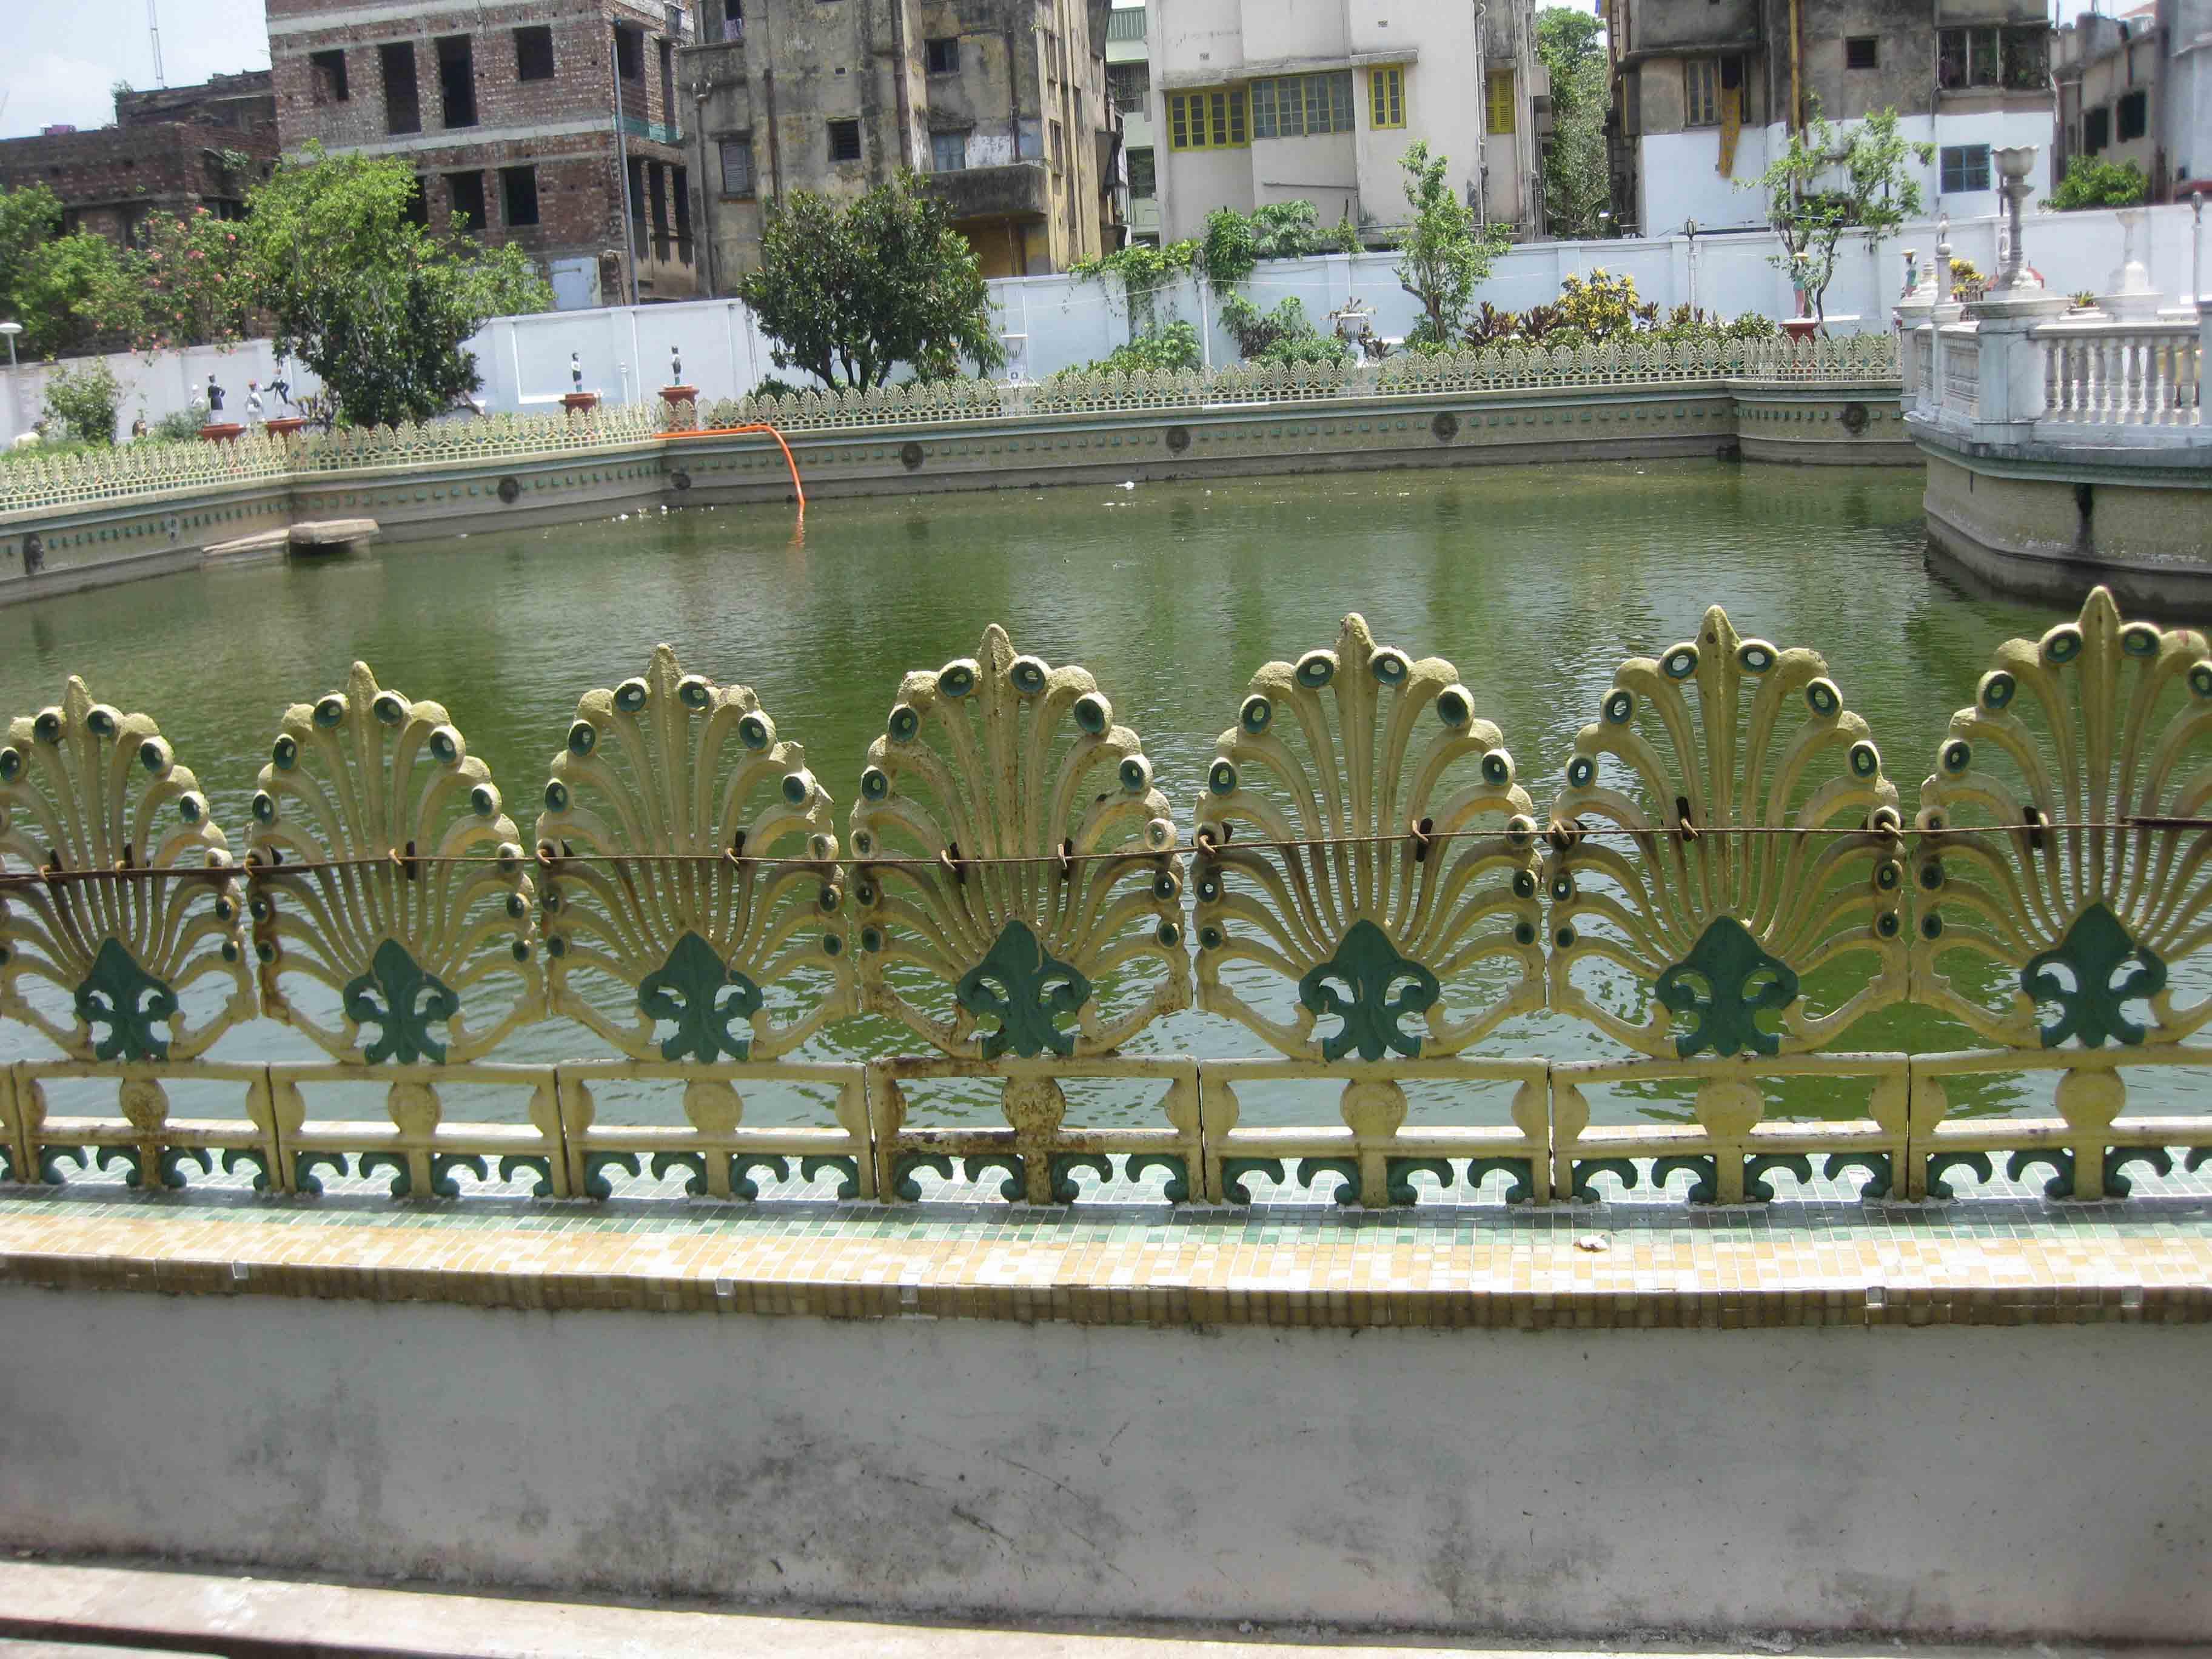 Cast iron railing surrounding the pond